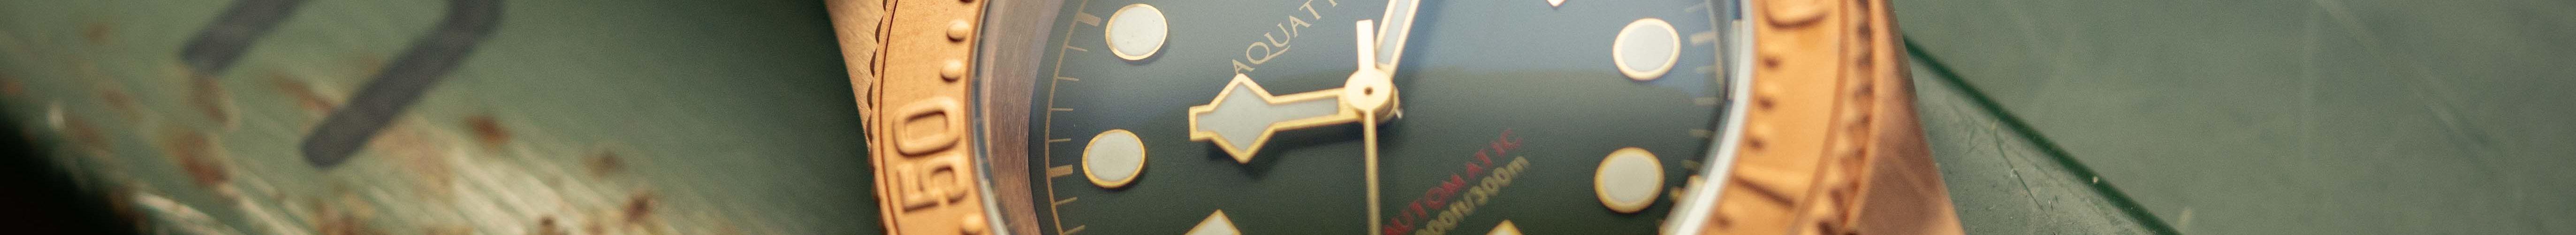 Aquatico Bronze Taucheruhr Diver Sea Star-12